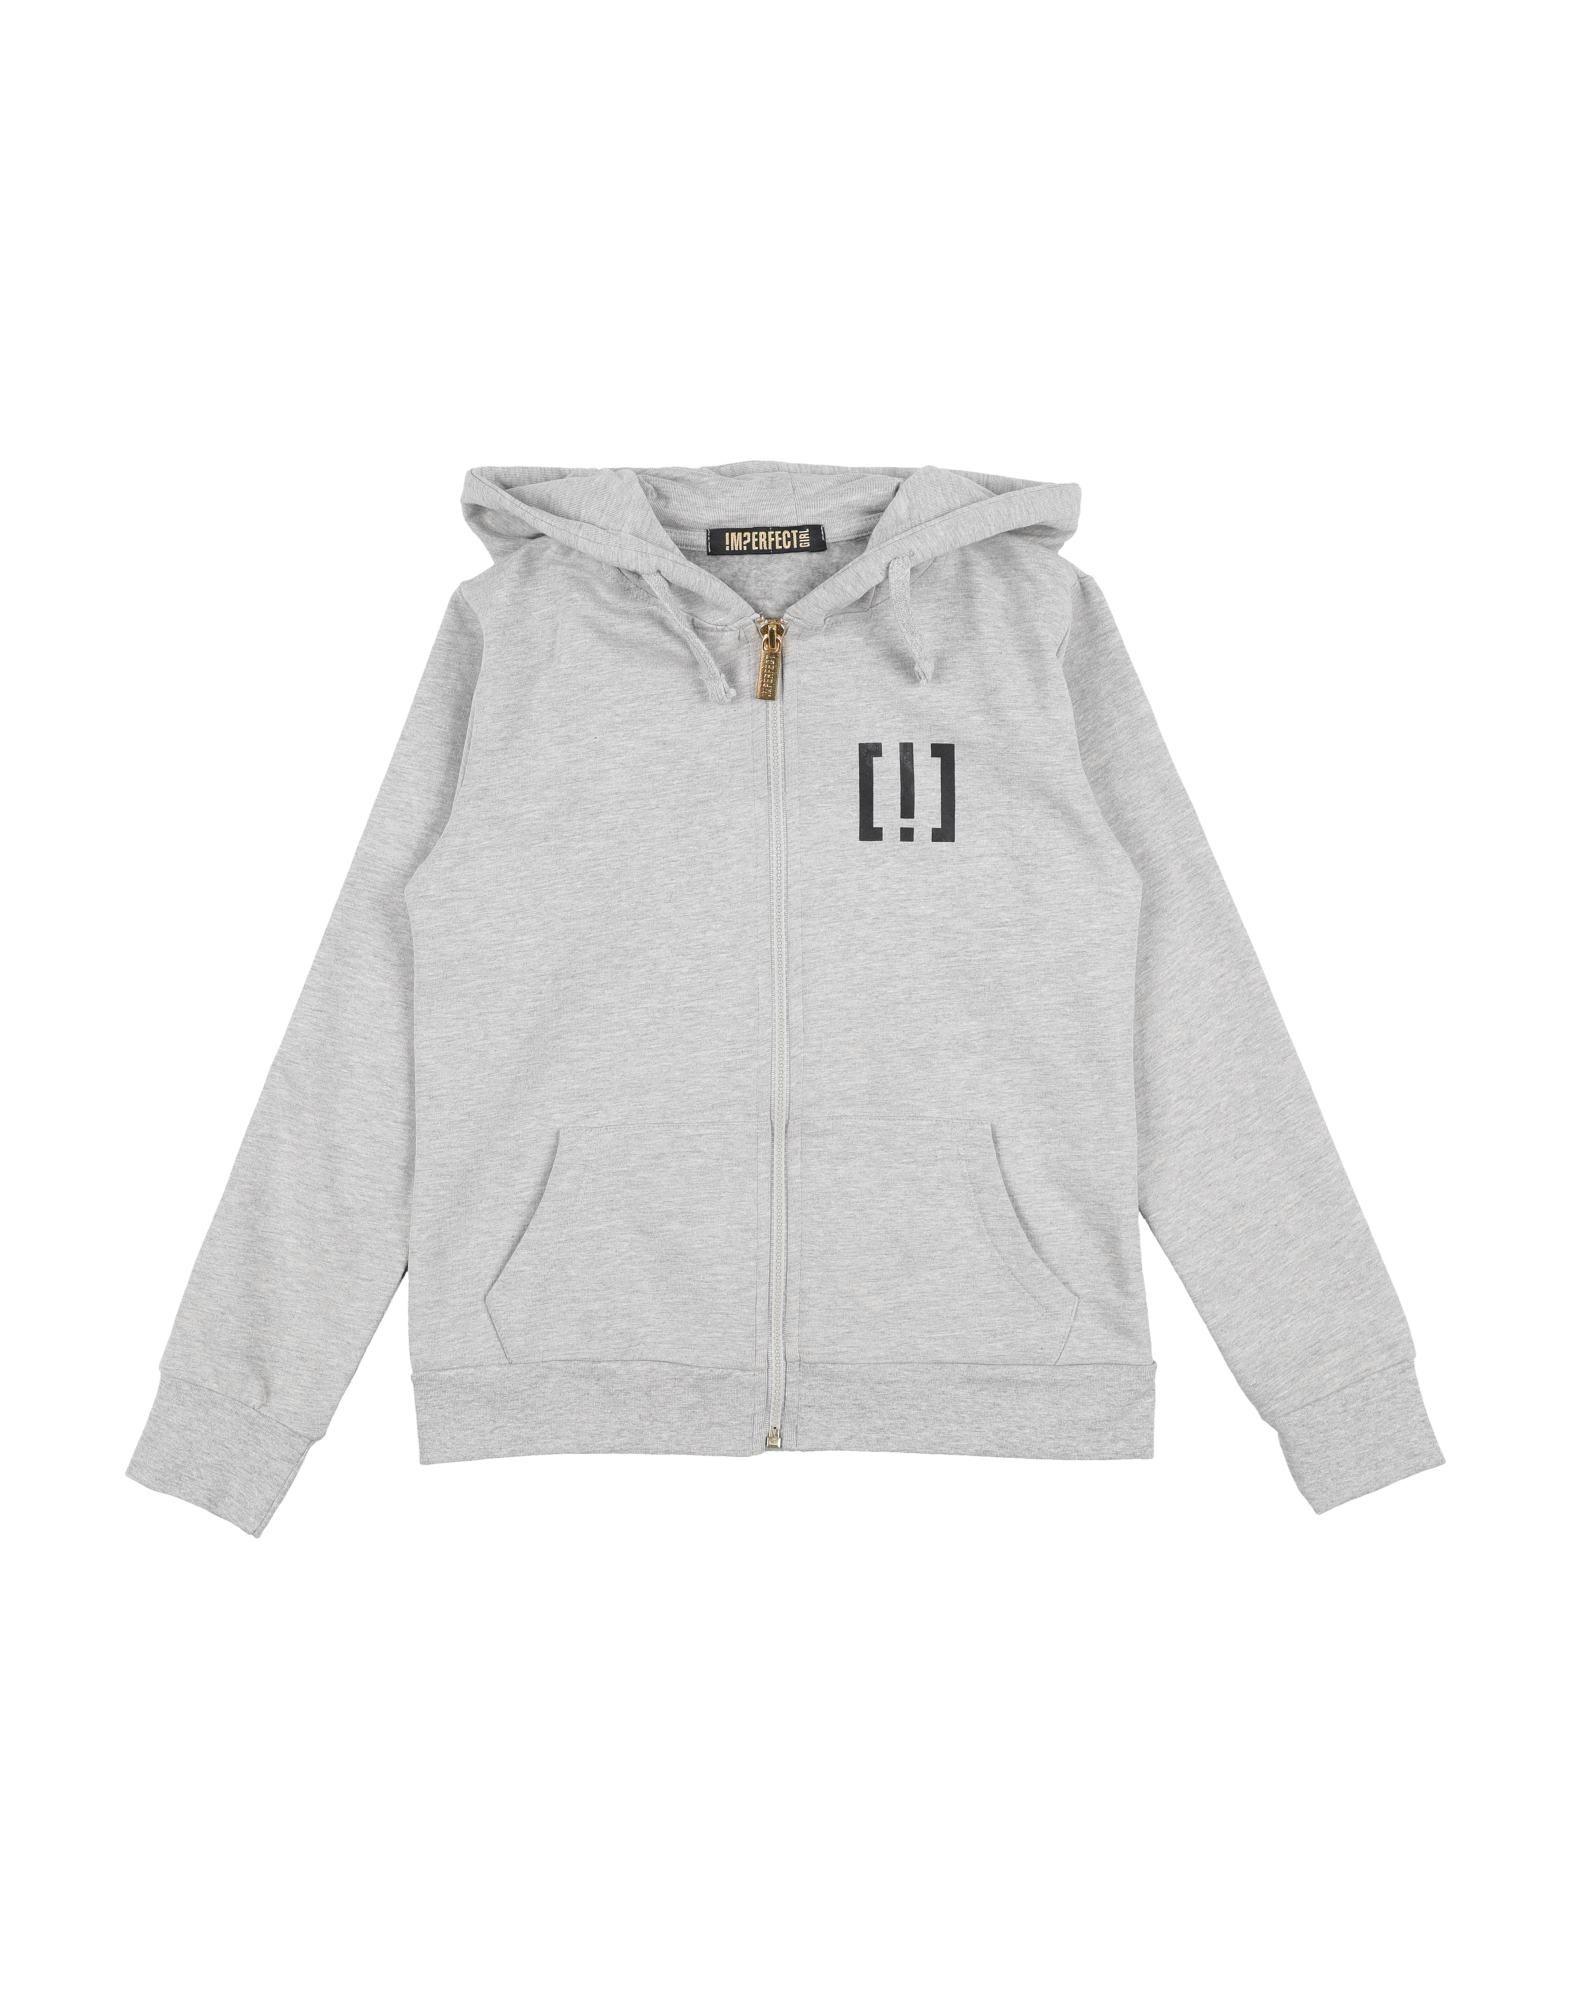 !m?erfect Kids'  Sweatshirts In Light Grey